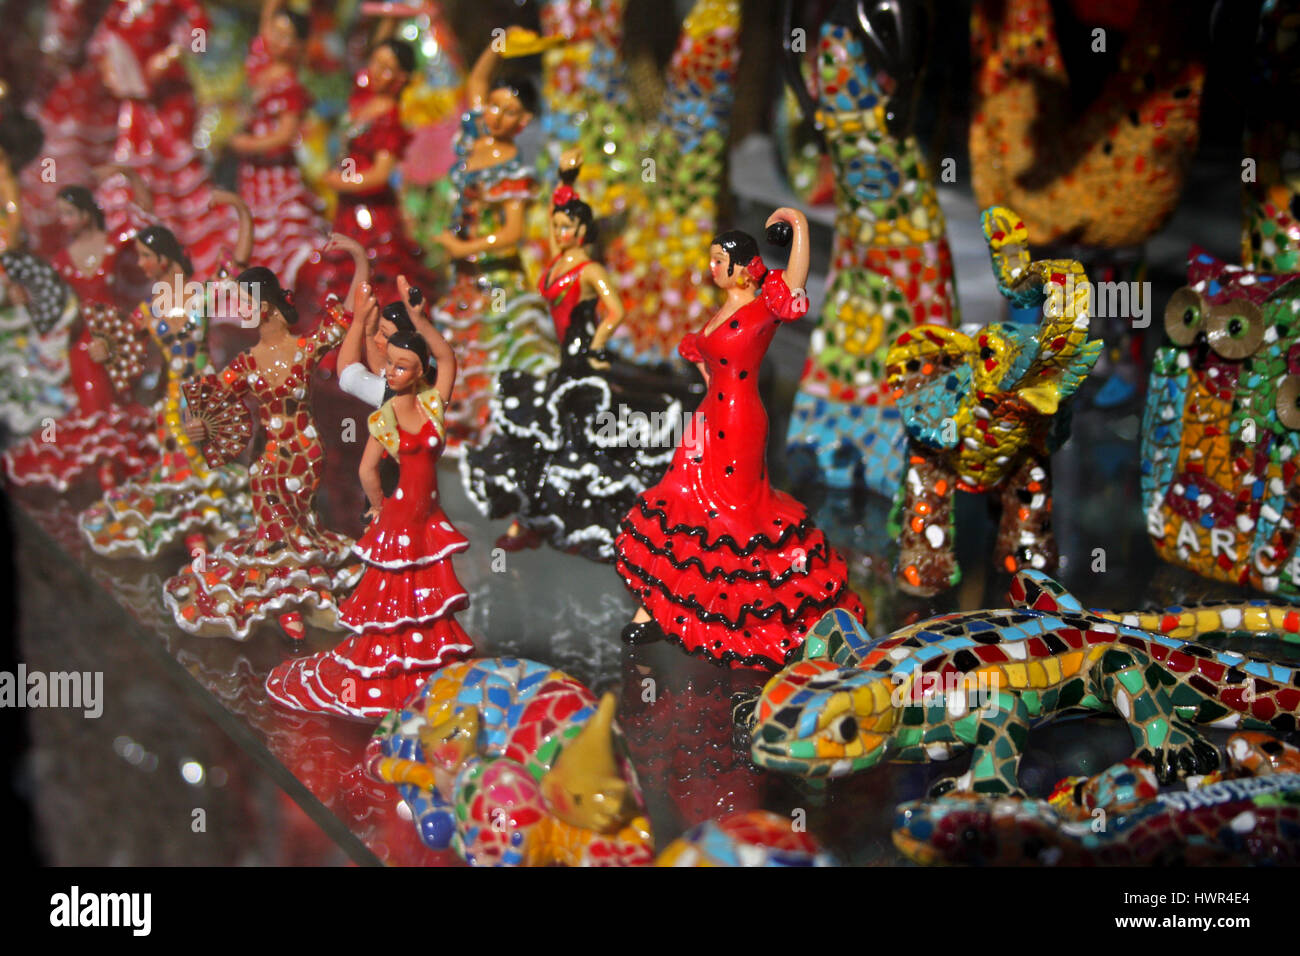 Kitsch tourist souvenirs on La Rambla - Stock Image